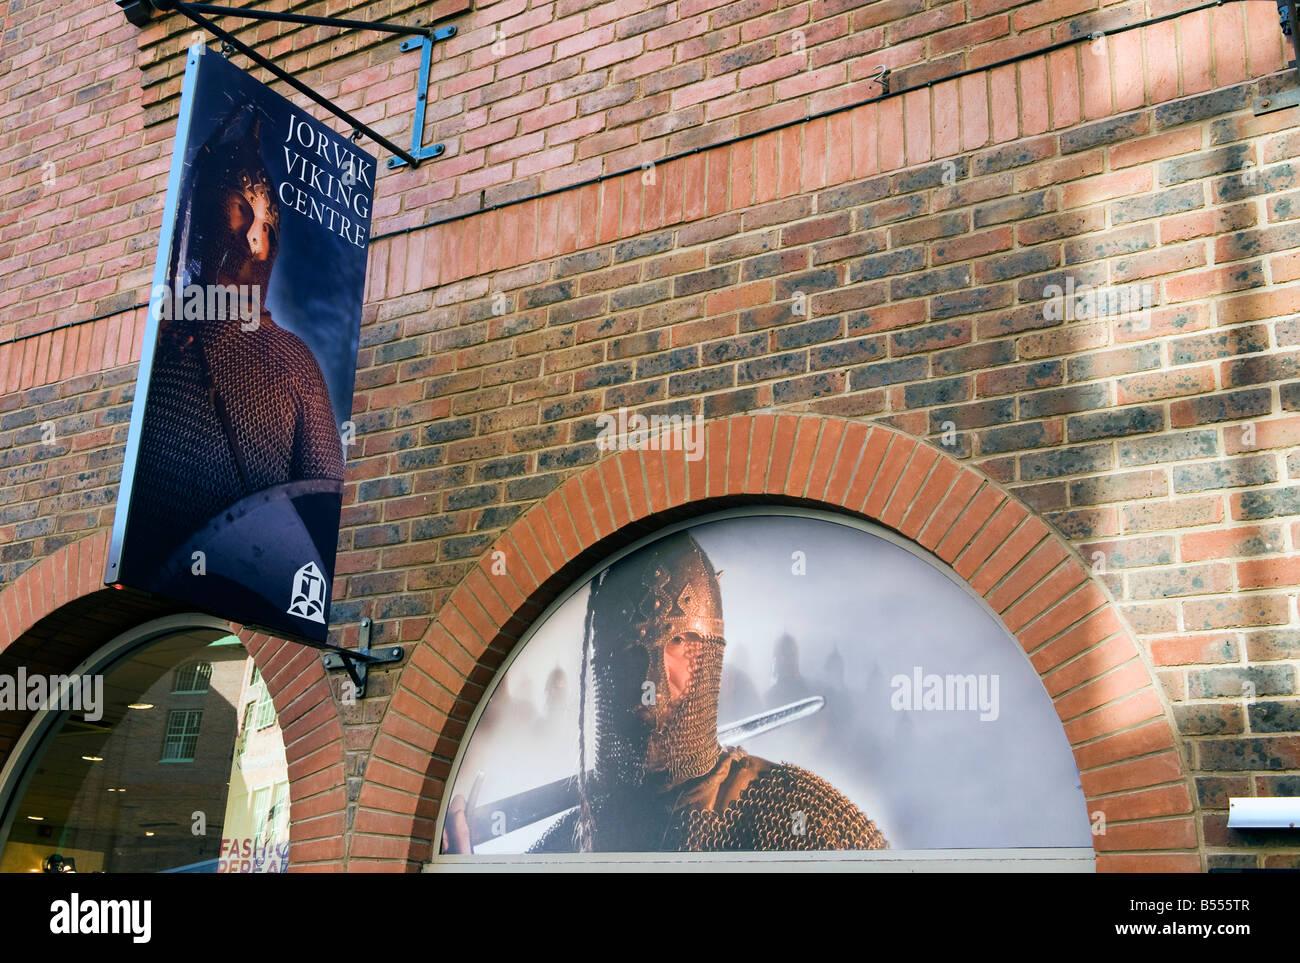 Jorvik viking centre in York, England, 'Great Britain' - Stock Image